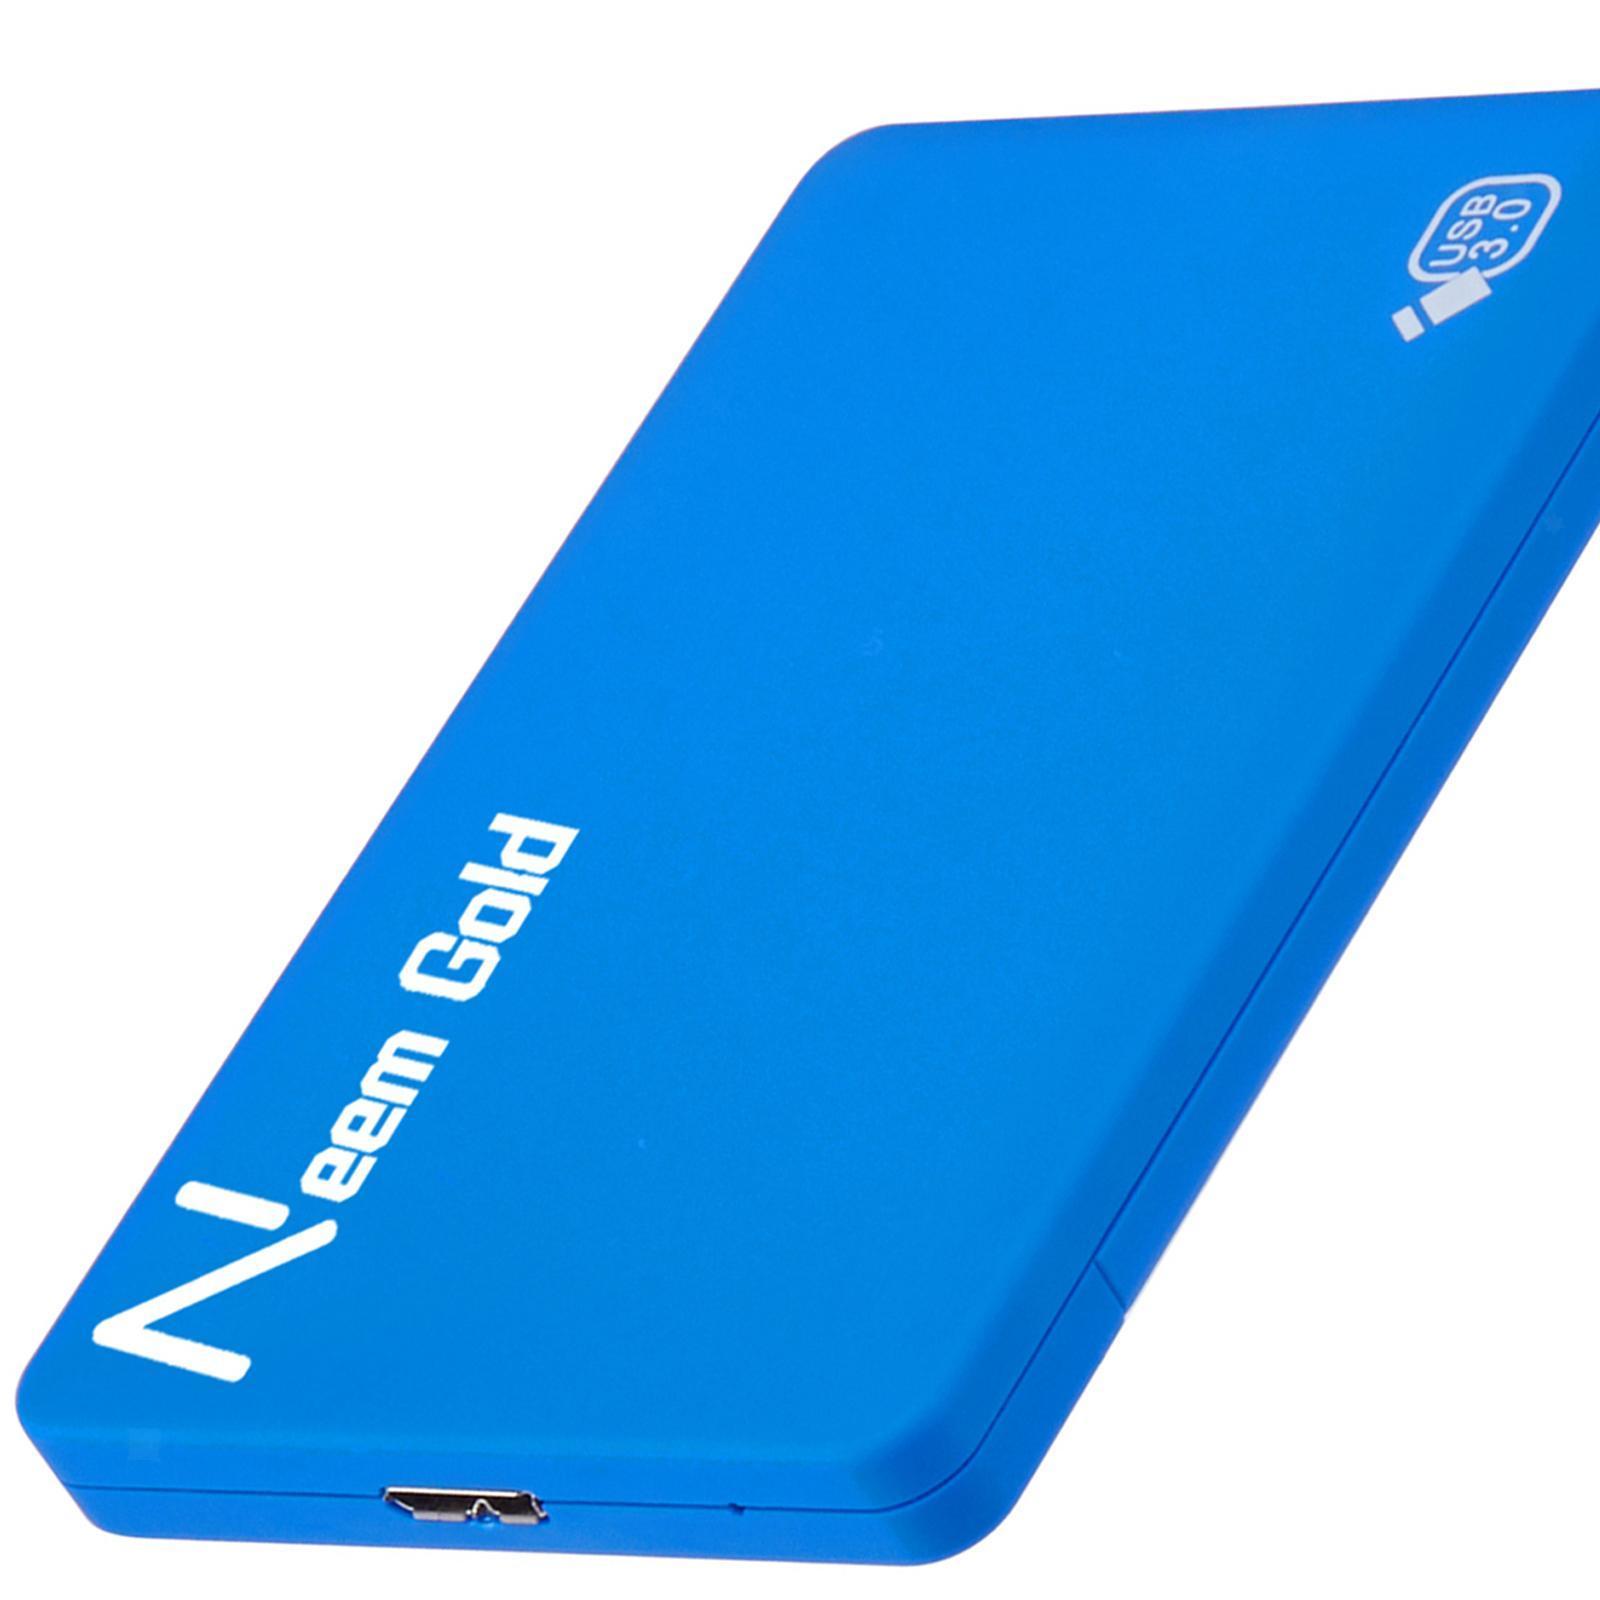 miniature 19 - ABS External Portable USB 3.0 Hard Drive Disk HDD for Desktop Laptop New